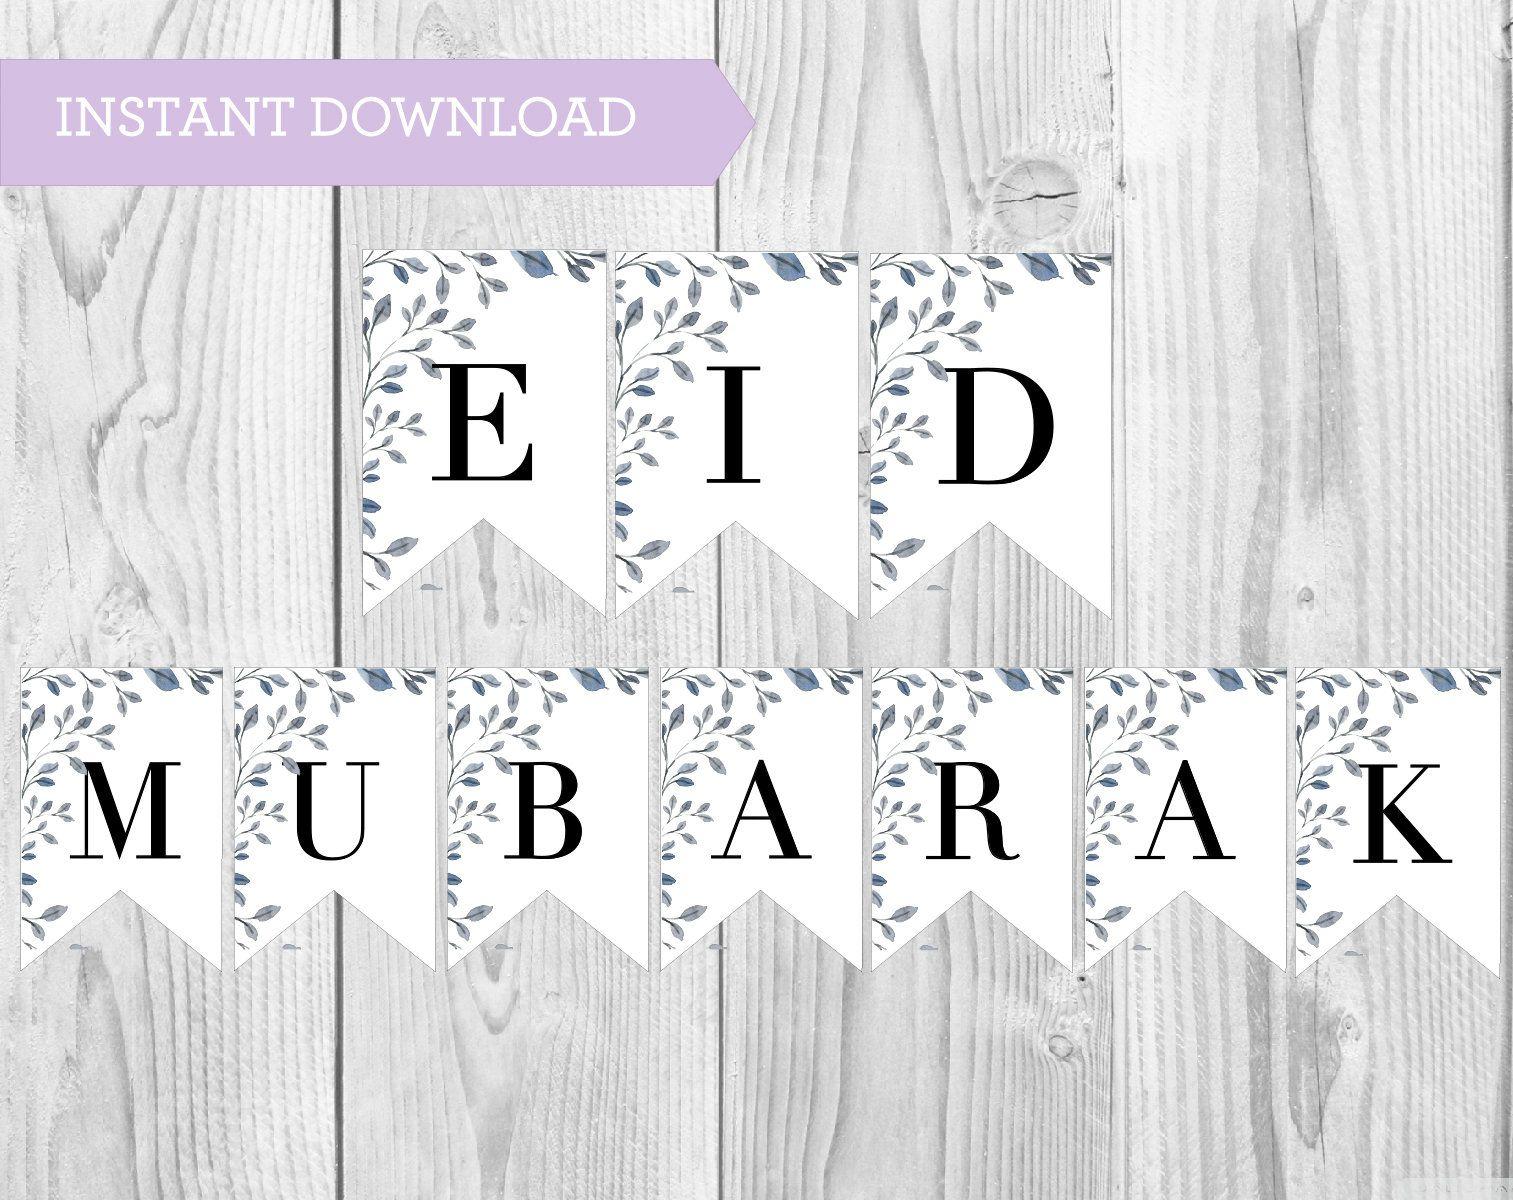 Diy Eid And Ramadan Mubarak Banner Set Monochrome Eid Decor Floral Eid Decor Diy Printable Banner Bunting Printable Eid Decoration Eid Banner Eid Stickers